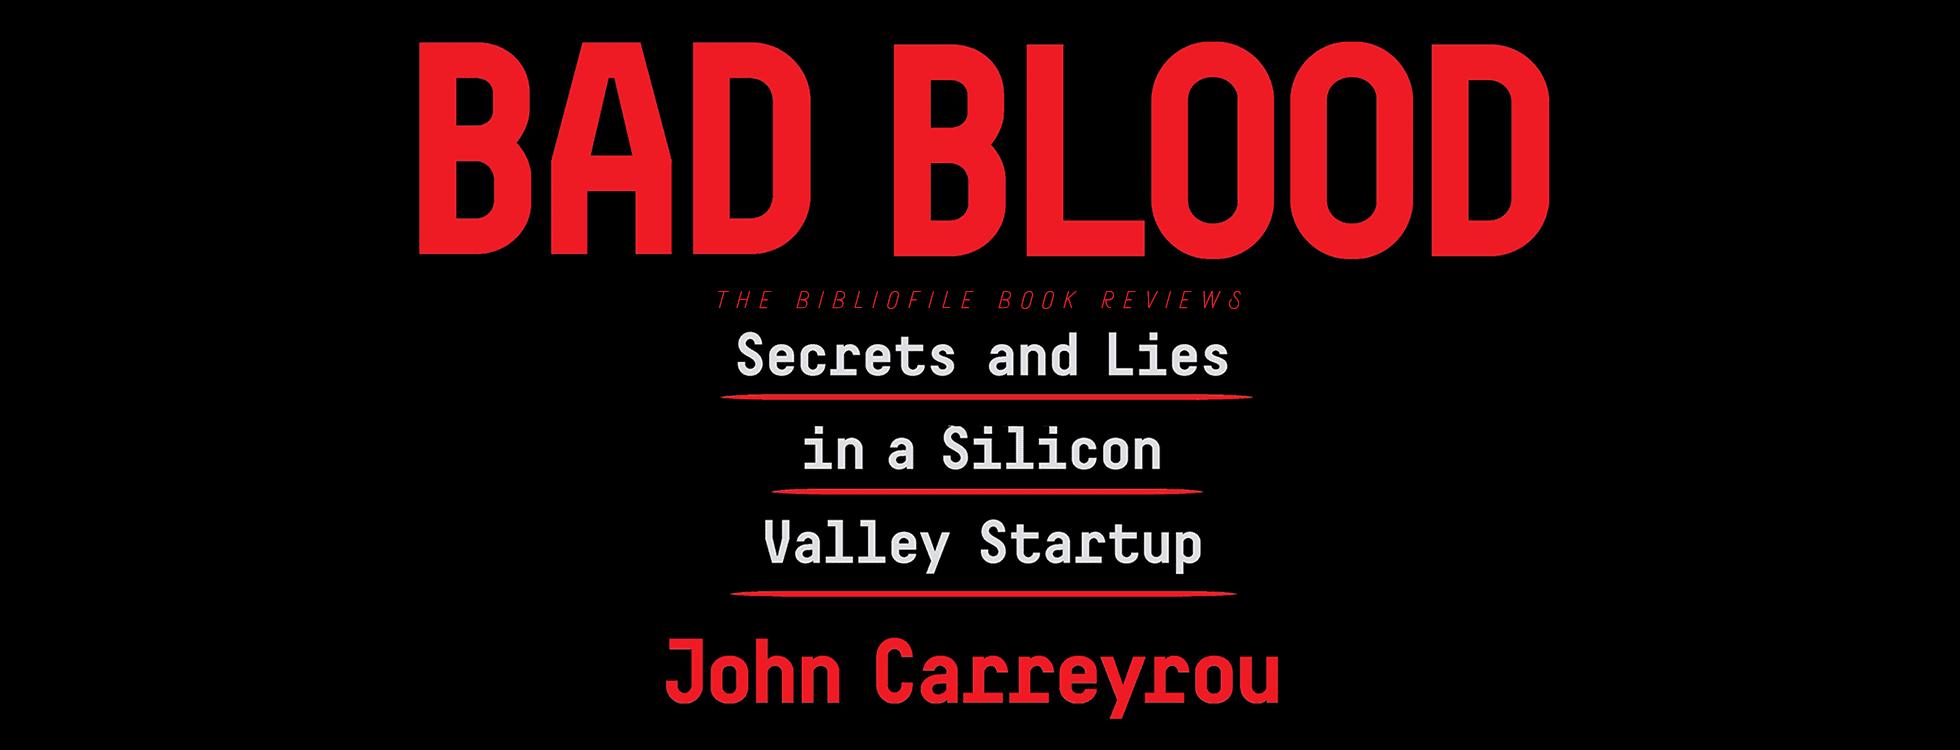 bad blood by john carreyrou book review summary key ideas key insights